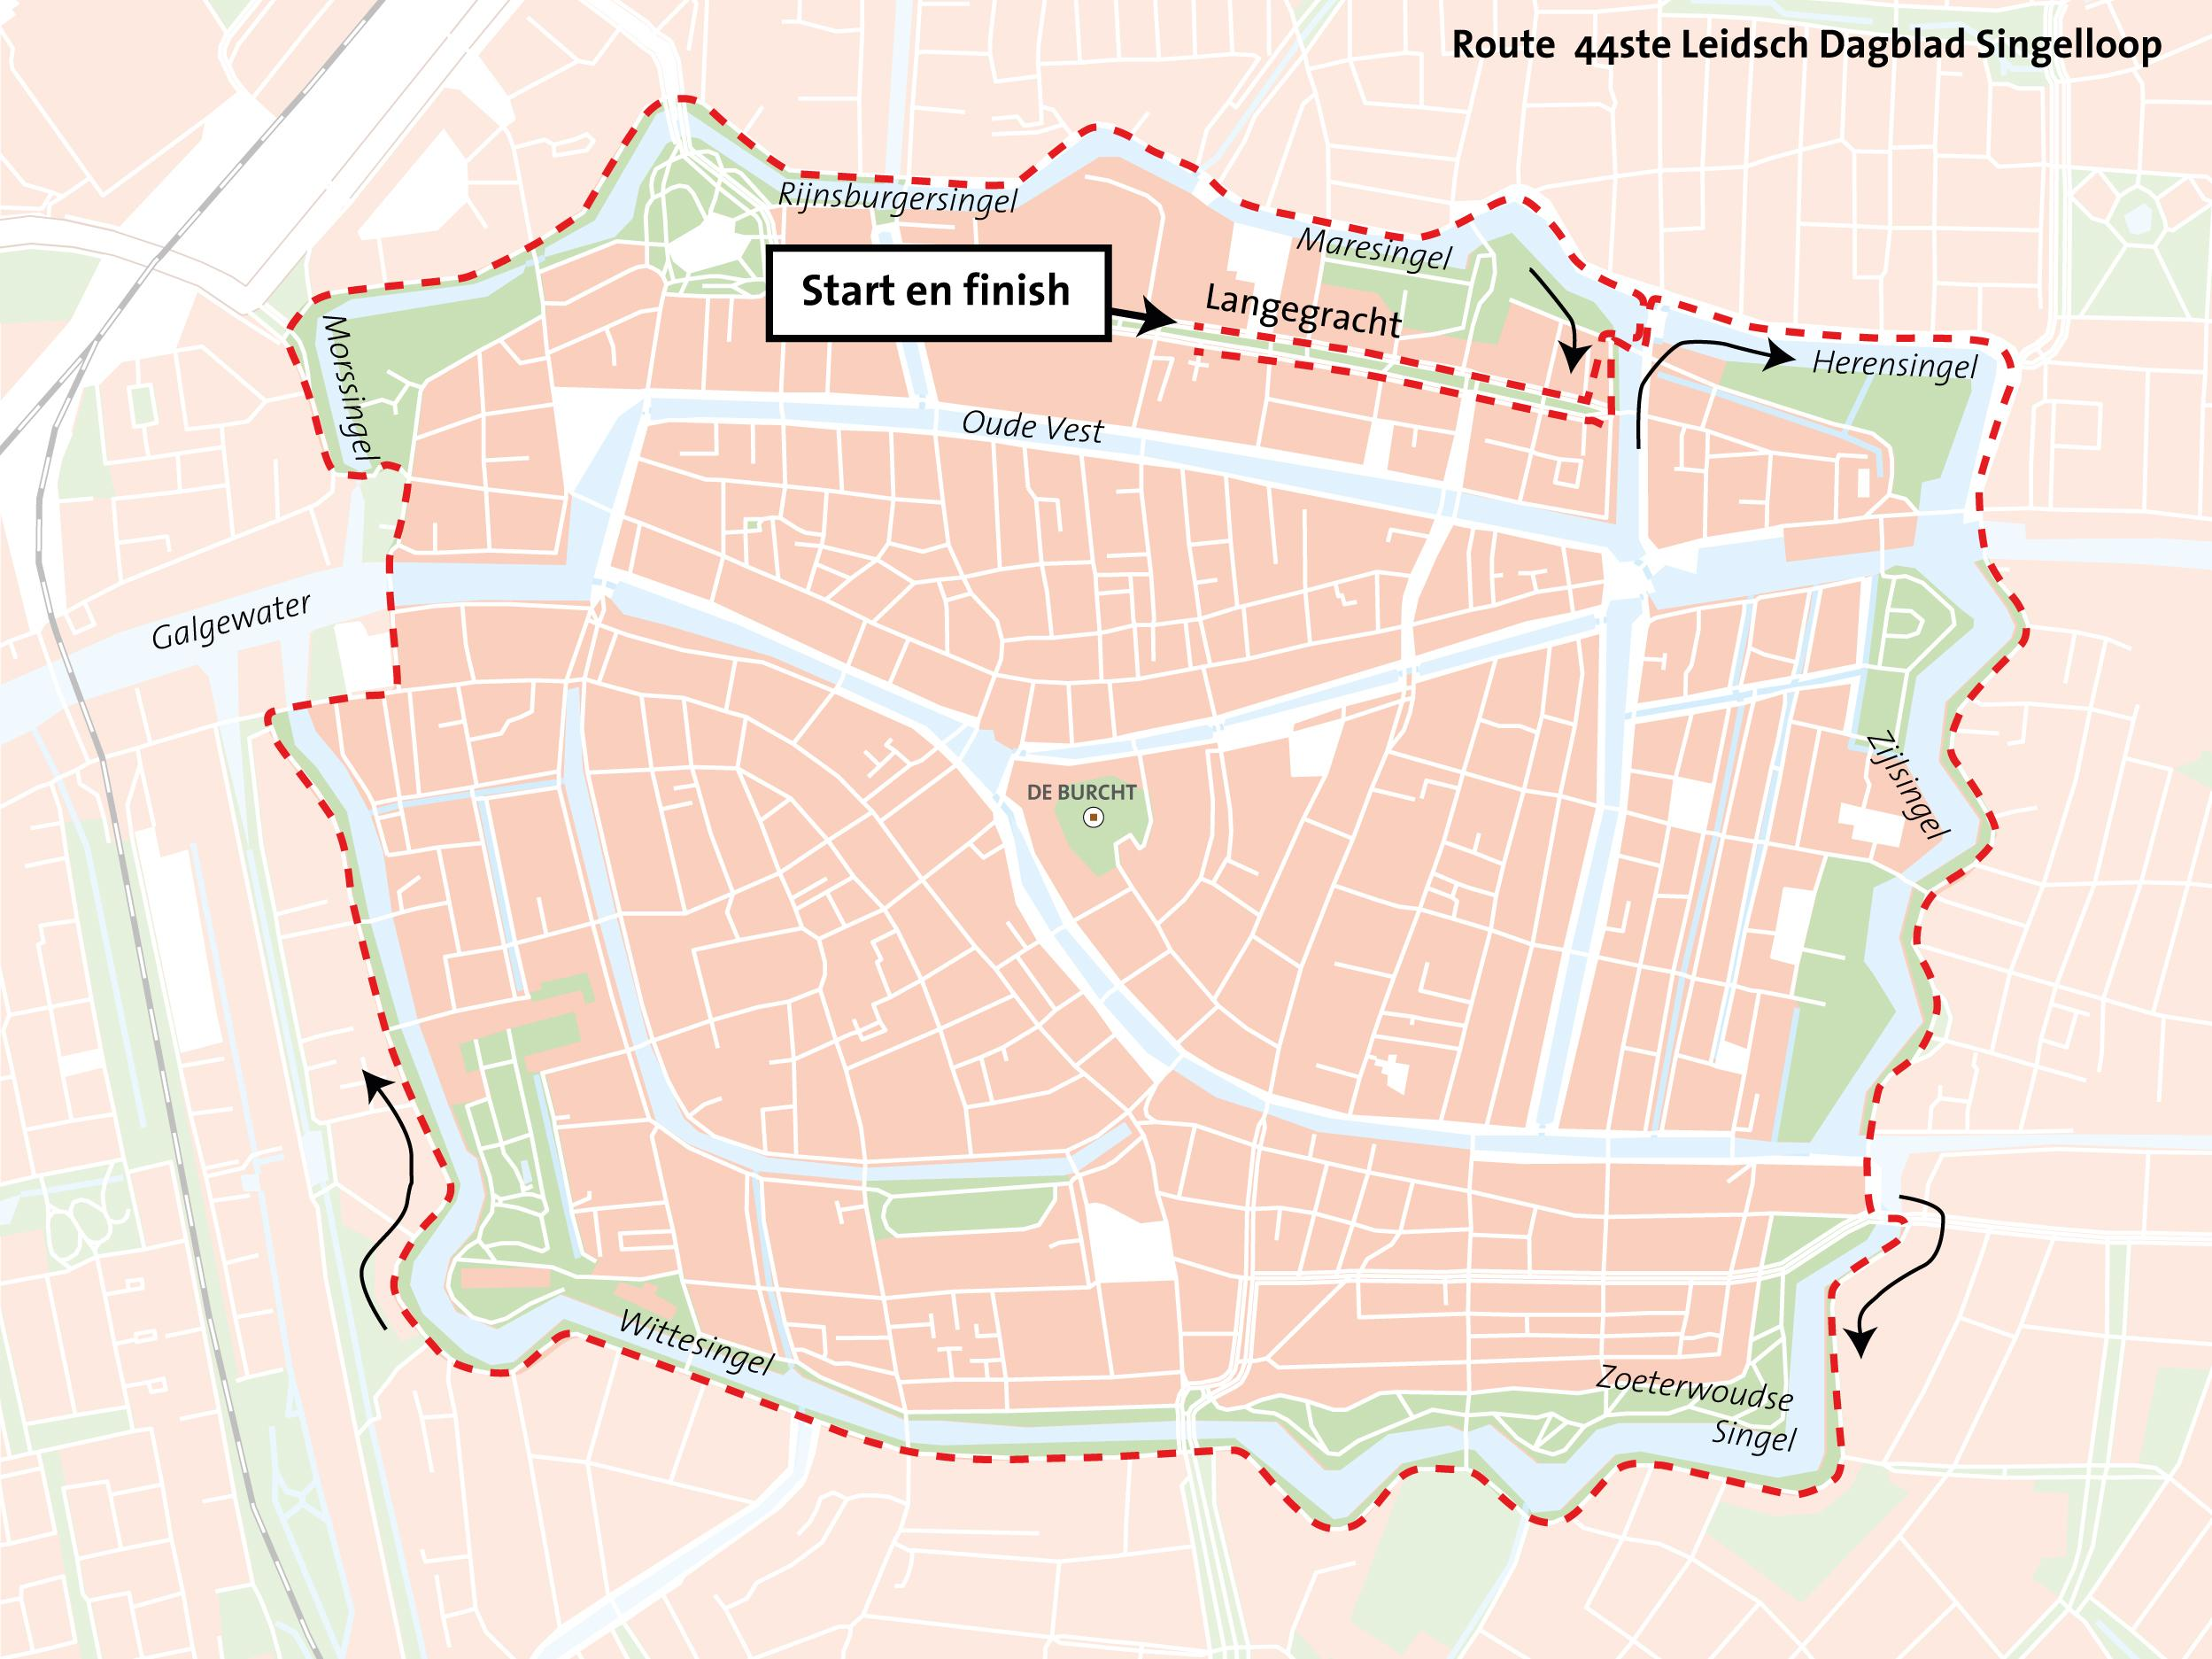 Update: 44ste Leidsch Dagblad Singelloop verwacht rond de 5500 deelnemers